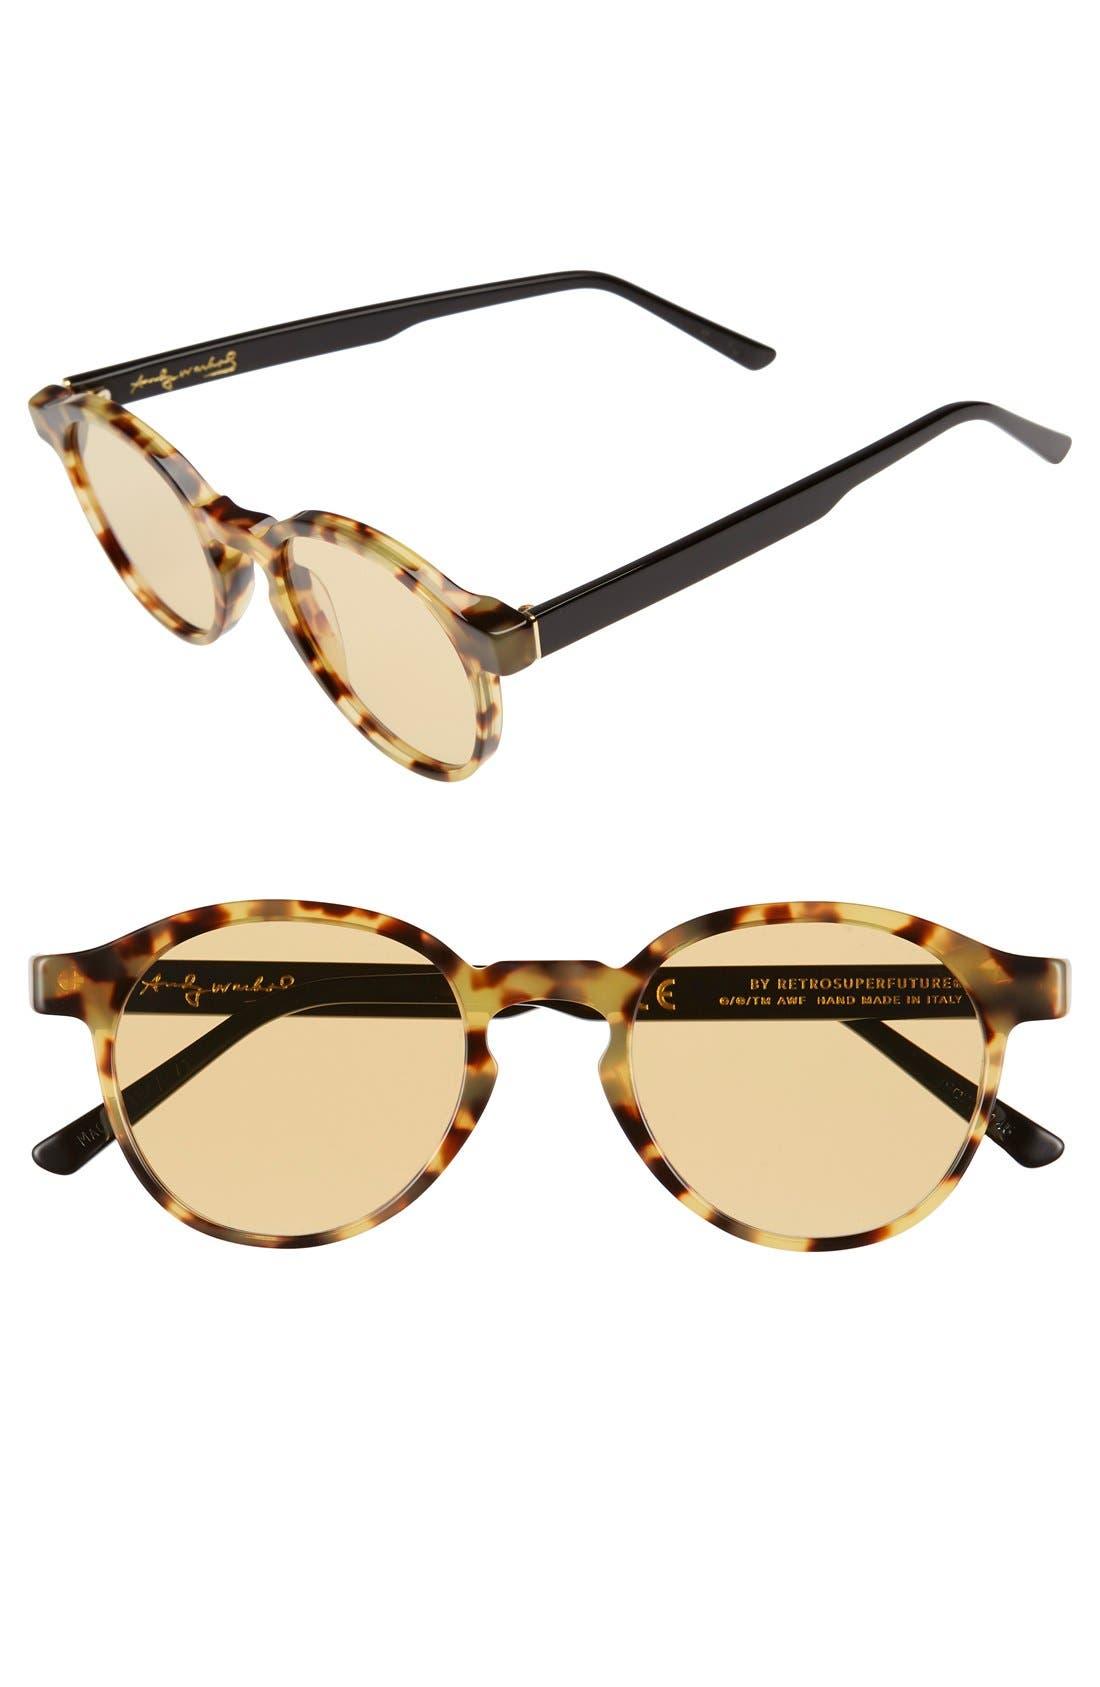 Main Image - SUPER by RETROSUPERFUTURE® 'Iconic' 49mm Sunglasses